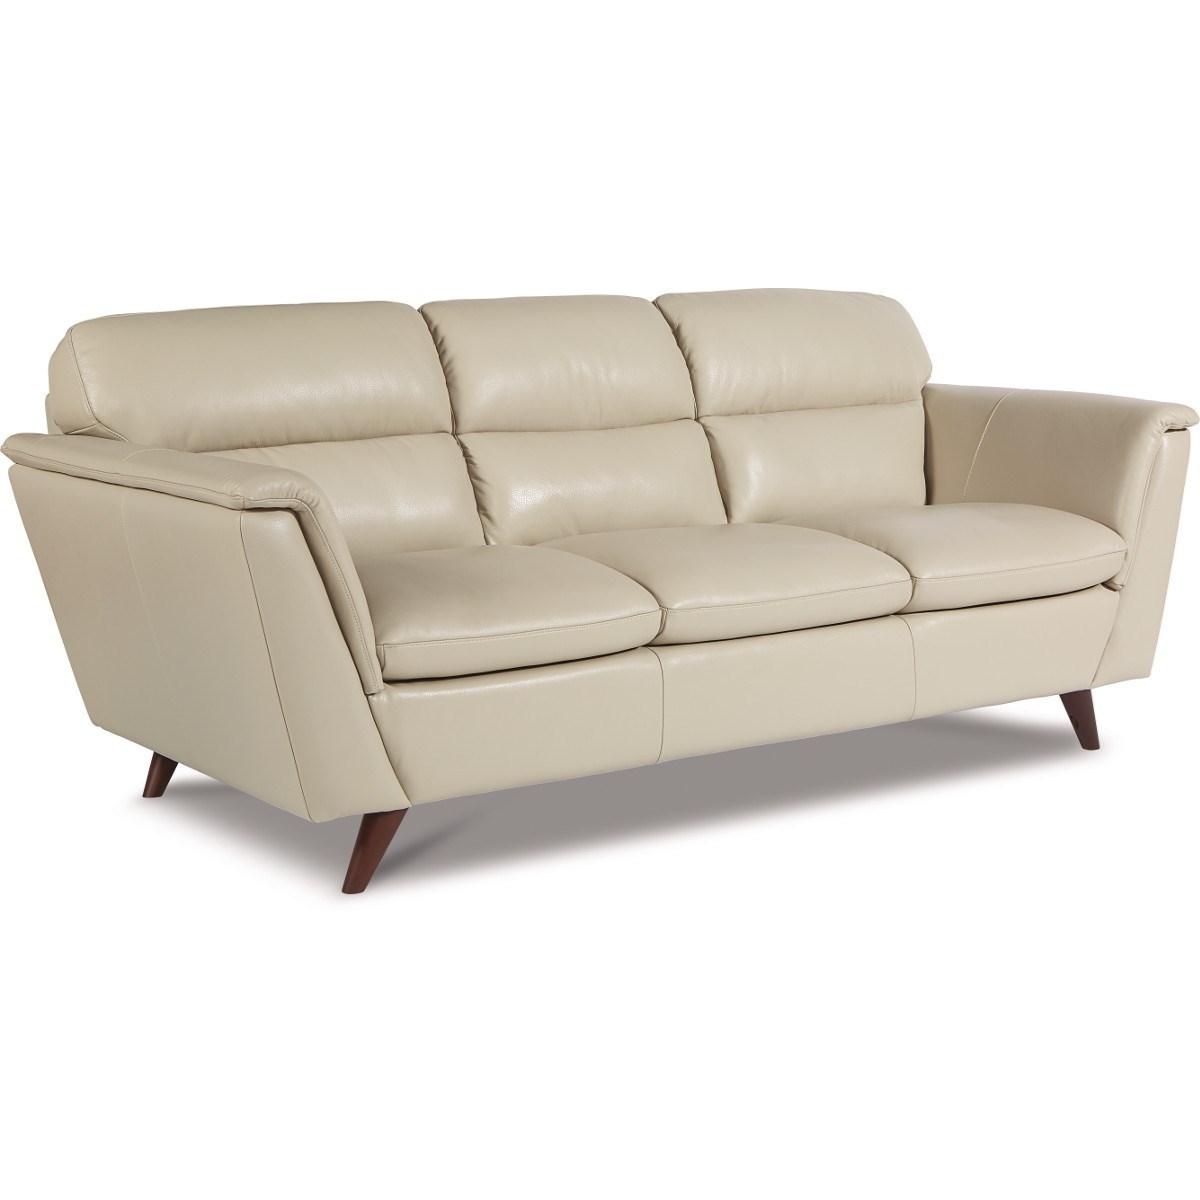 corinthian leather sofa usado la-z-boy arrow mid century modern | vandrie ...